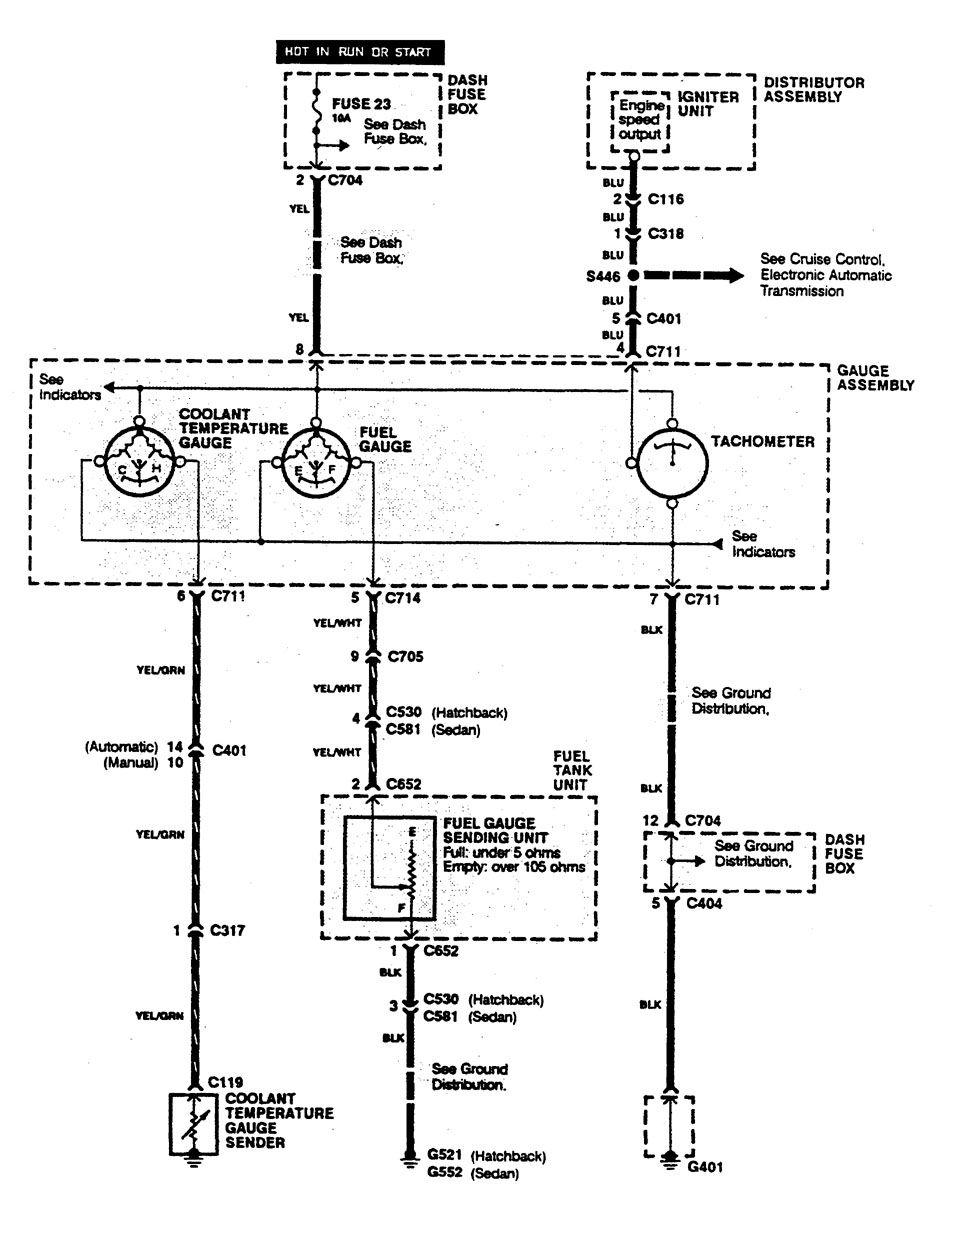 acura integra (1990) - wiring diagrams - instrumentation ... 1990 integra wiring diagram